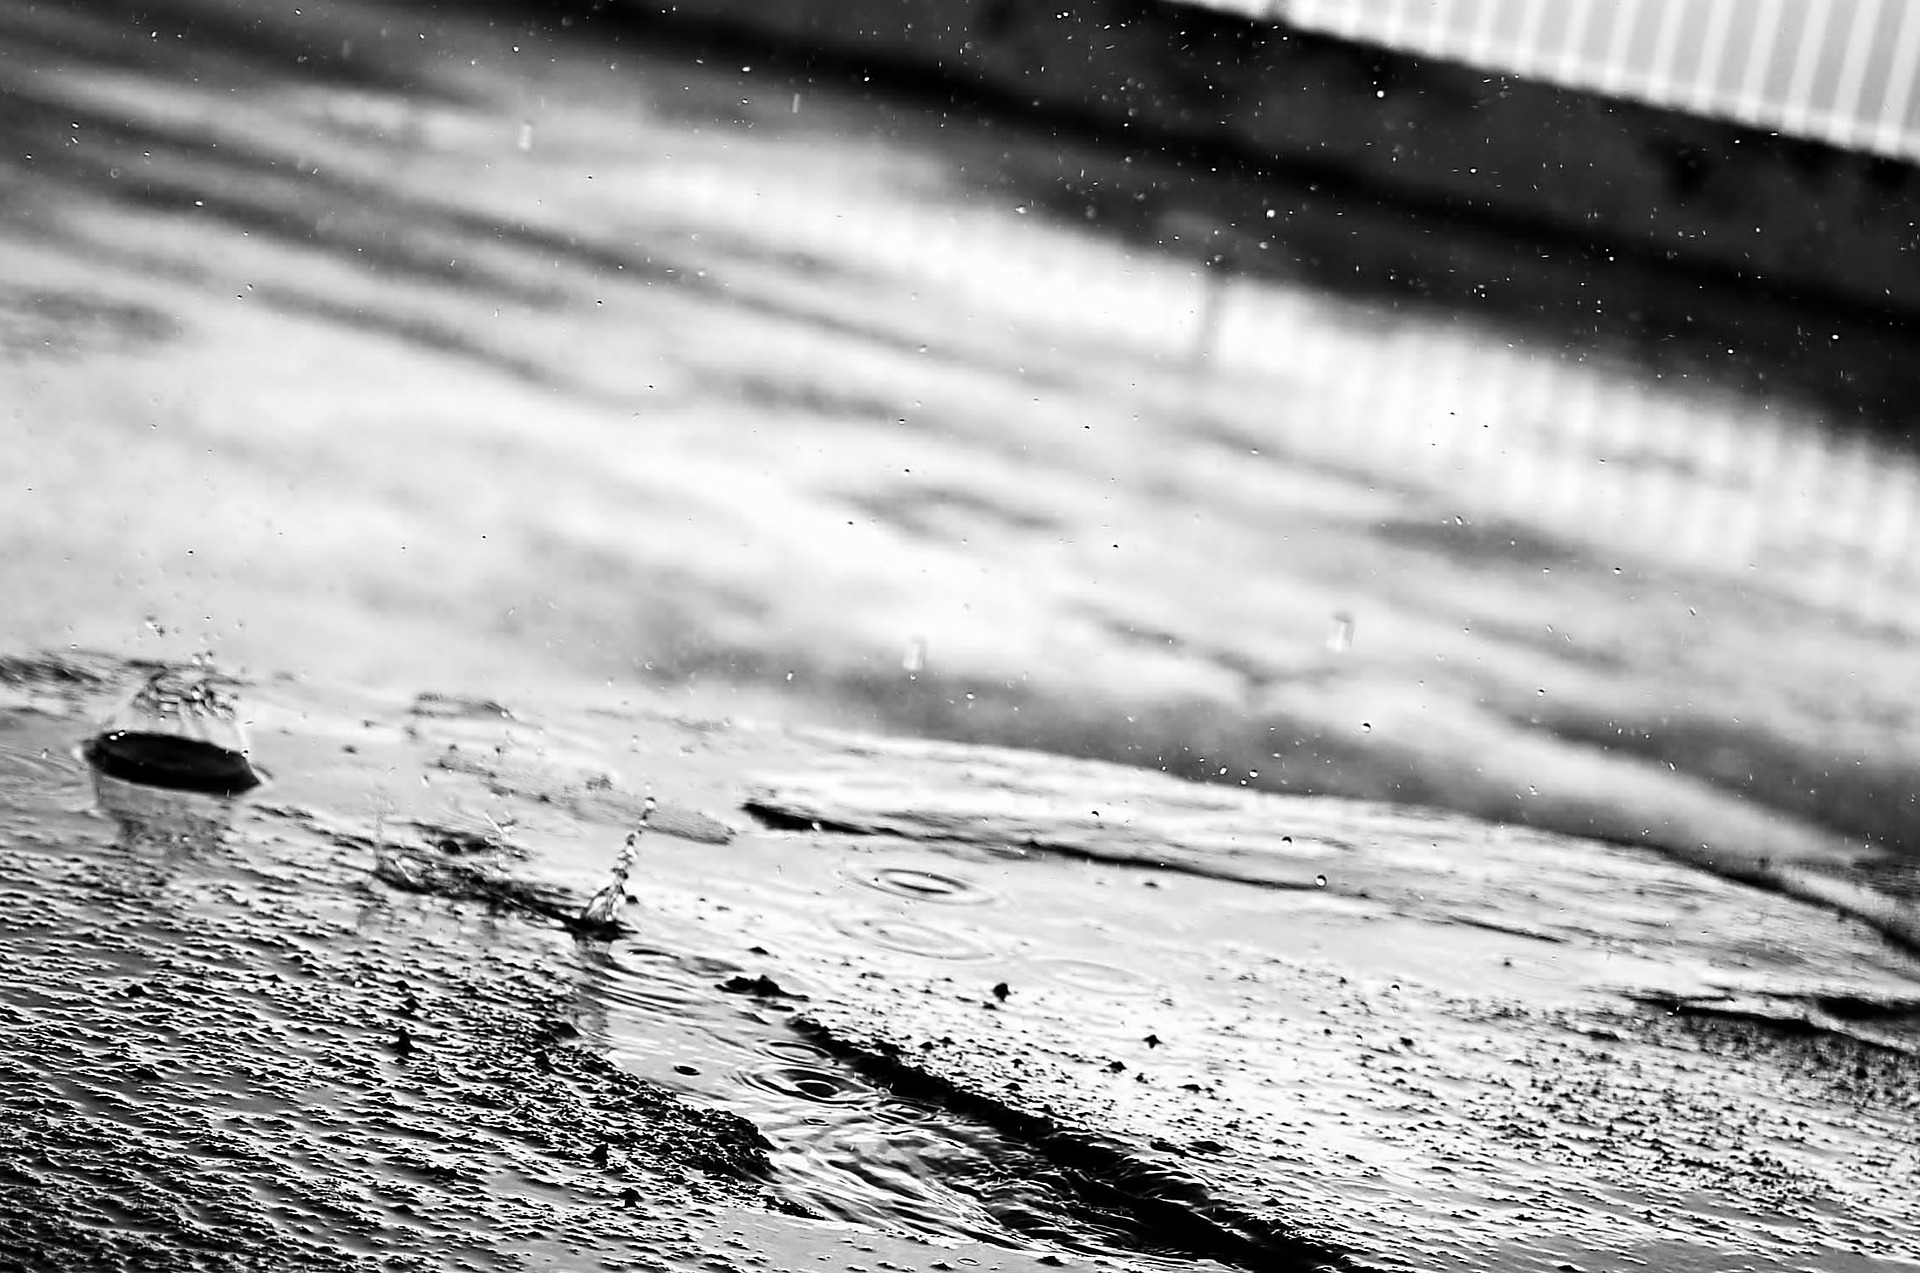 rain-162813_1920.jpg